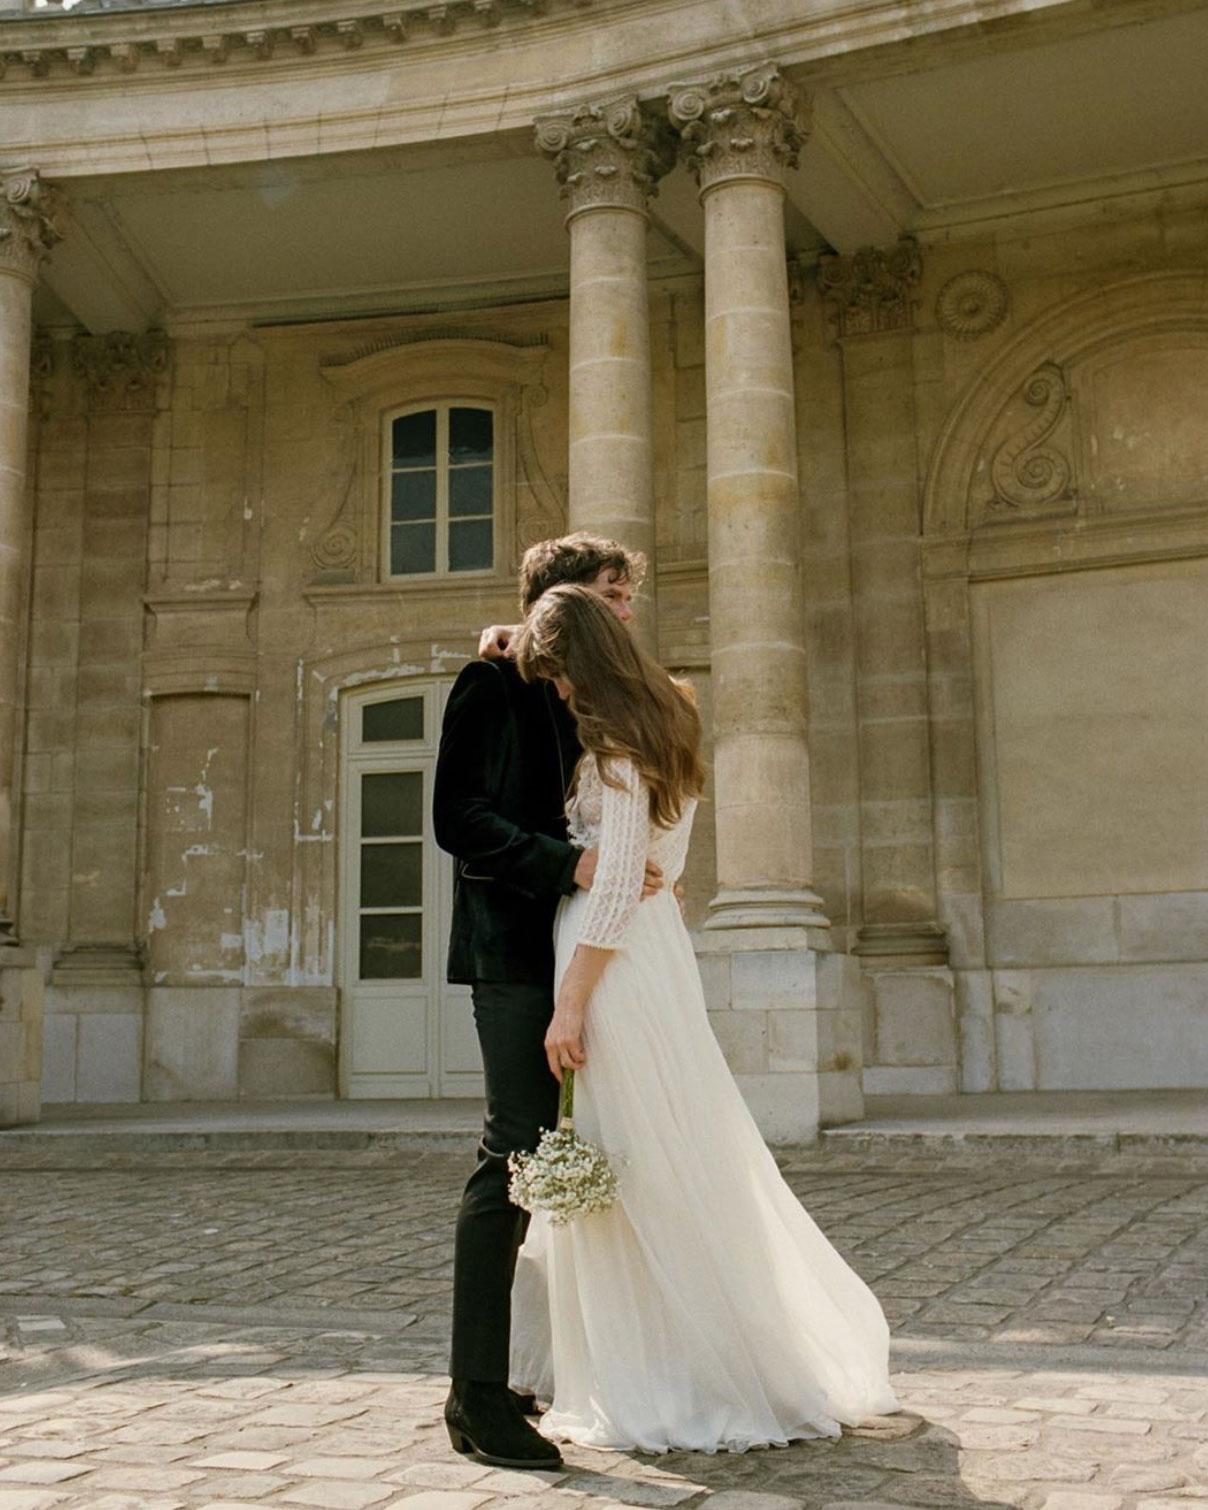 Phil-Chester-Sara-Byrne-Paris-Elopement-10.jpg